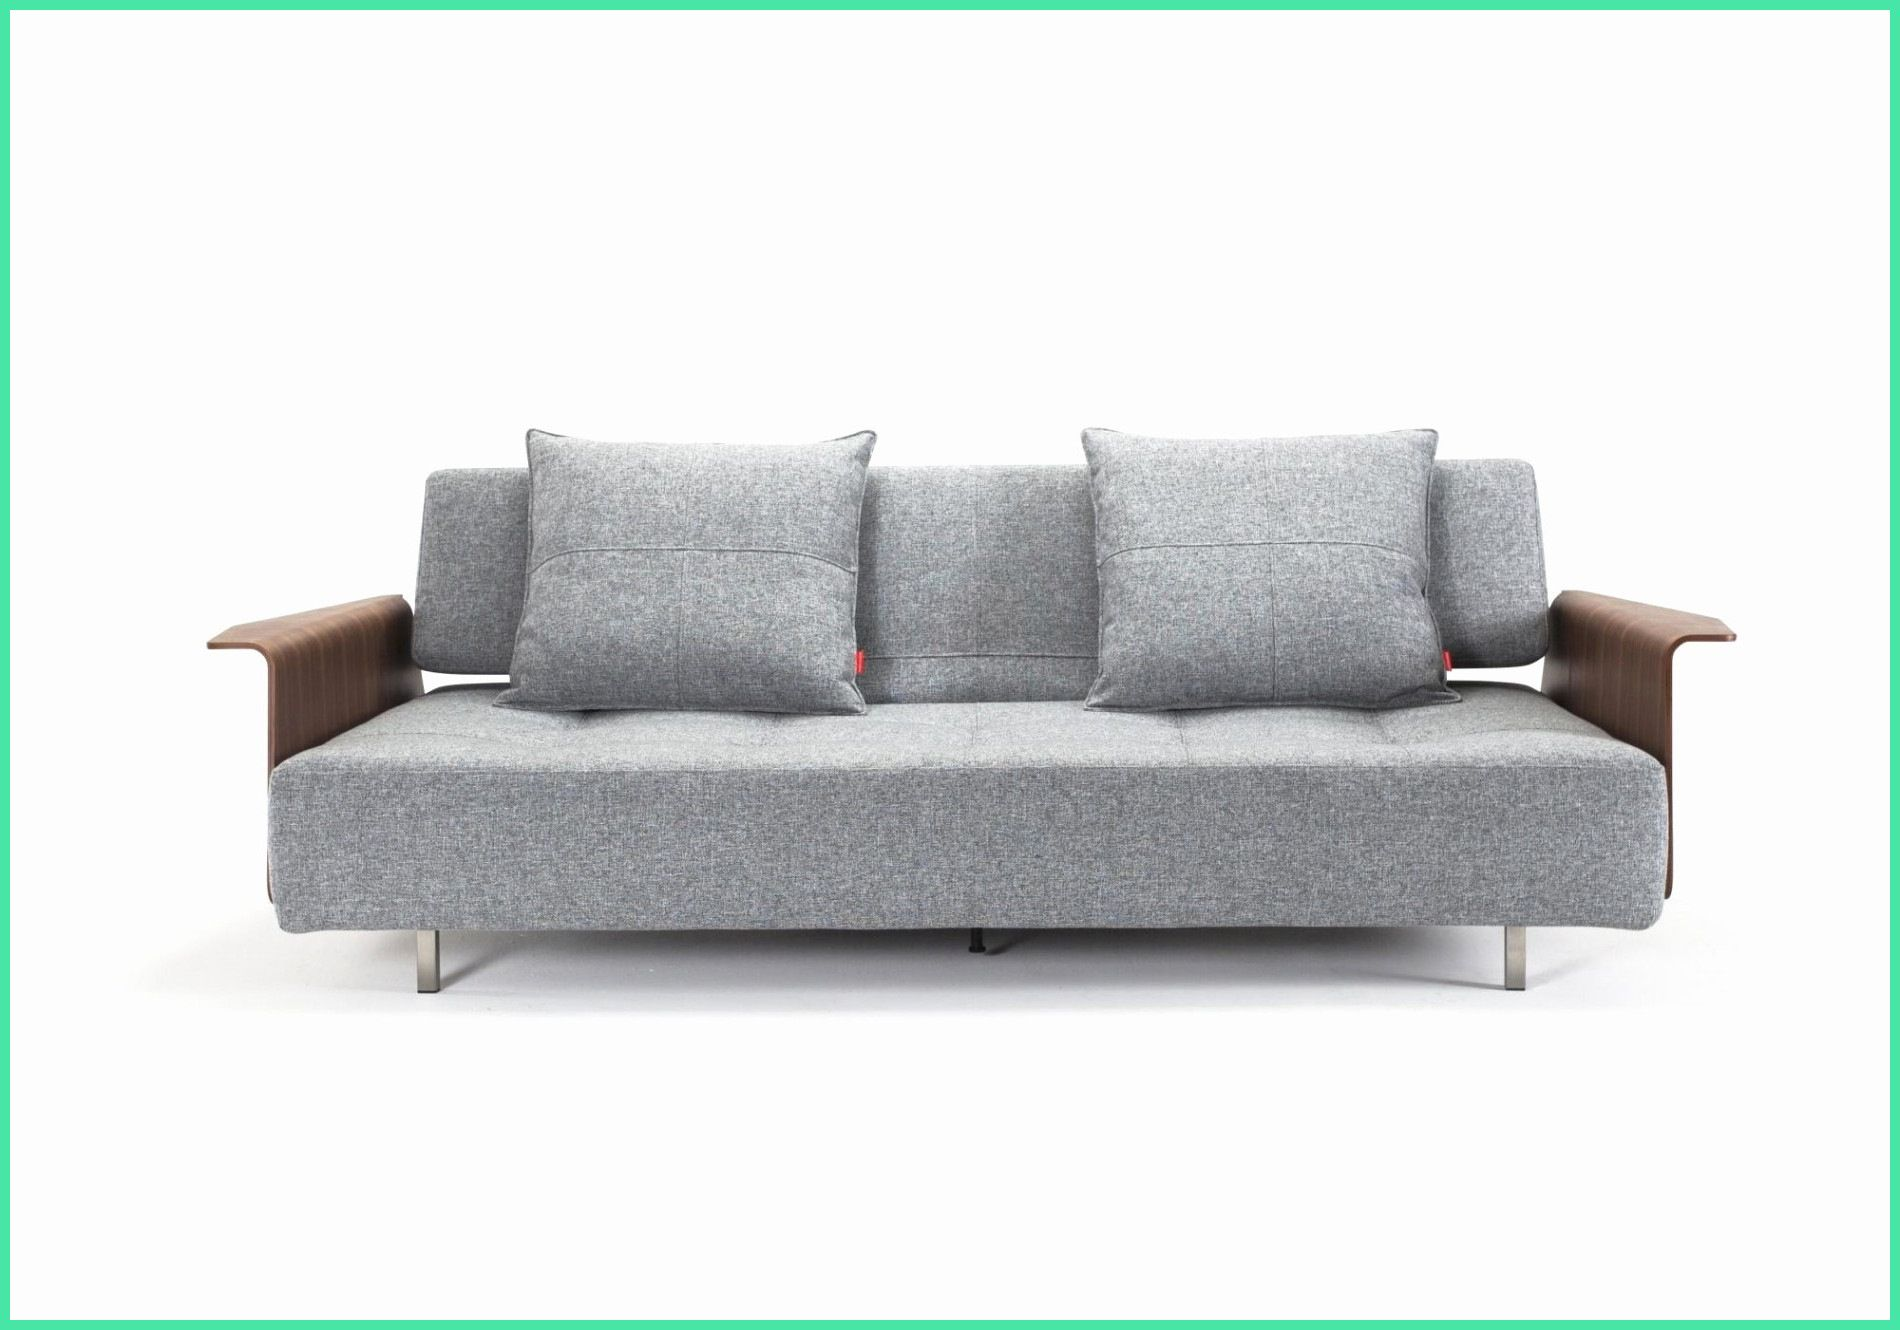 15 Einzigartig Sofa Ikea Rot